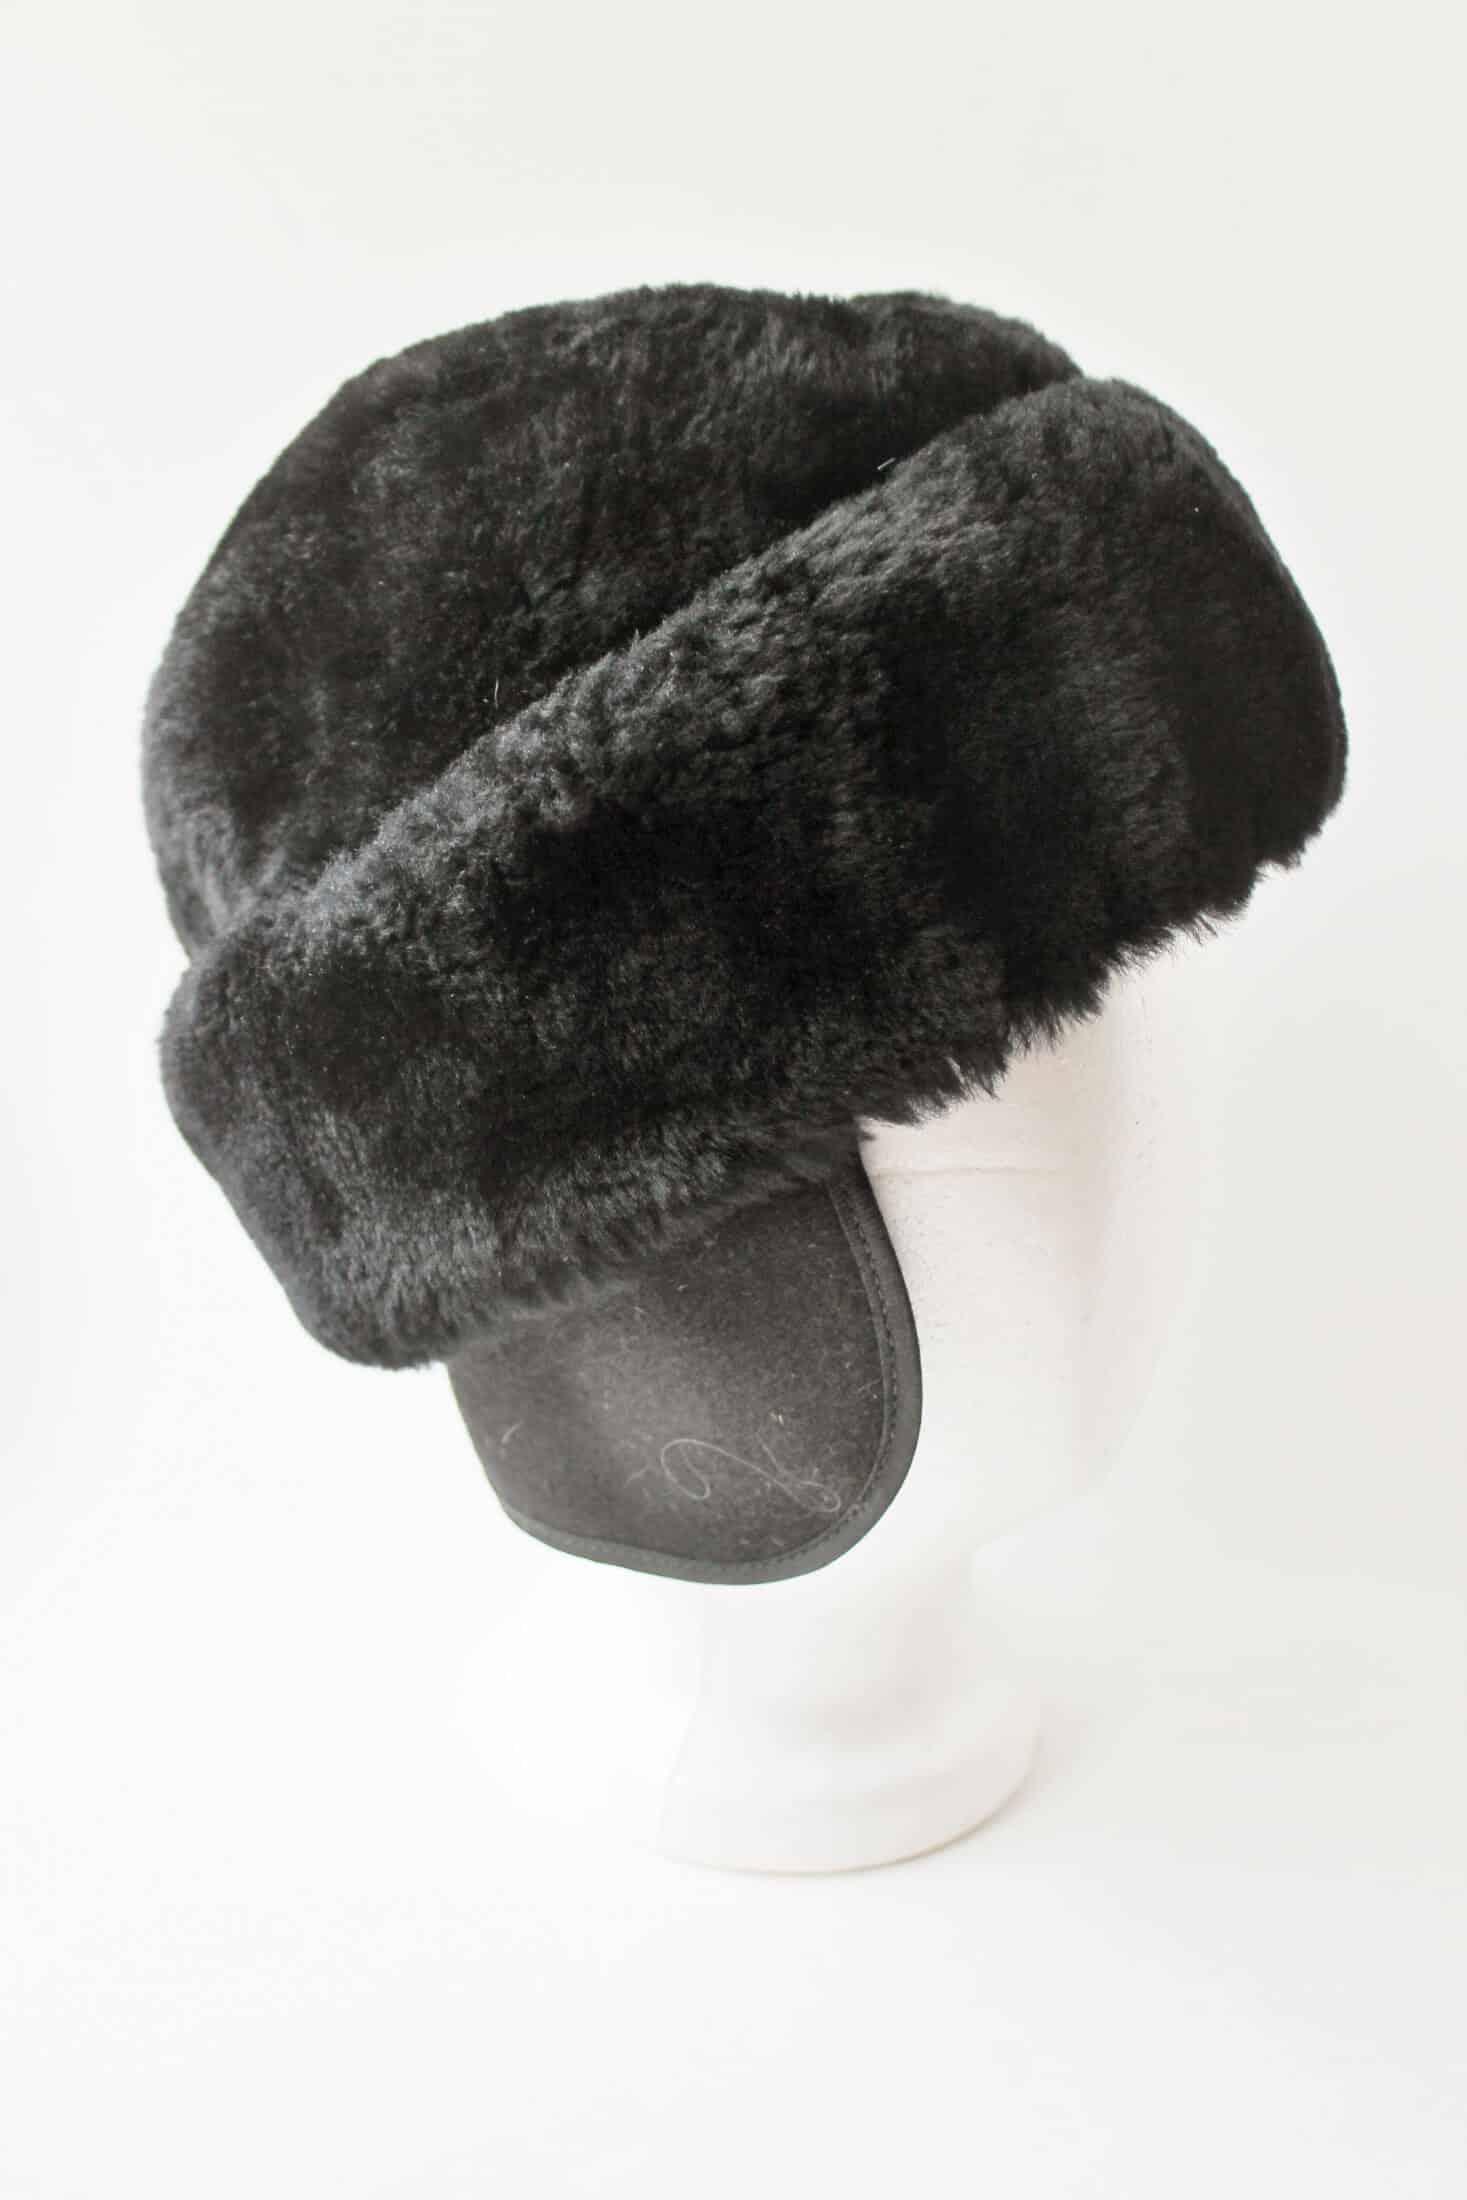 vintage men's winter hat